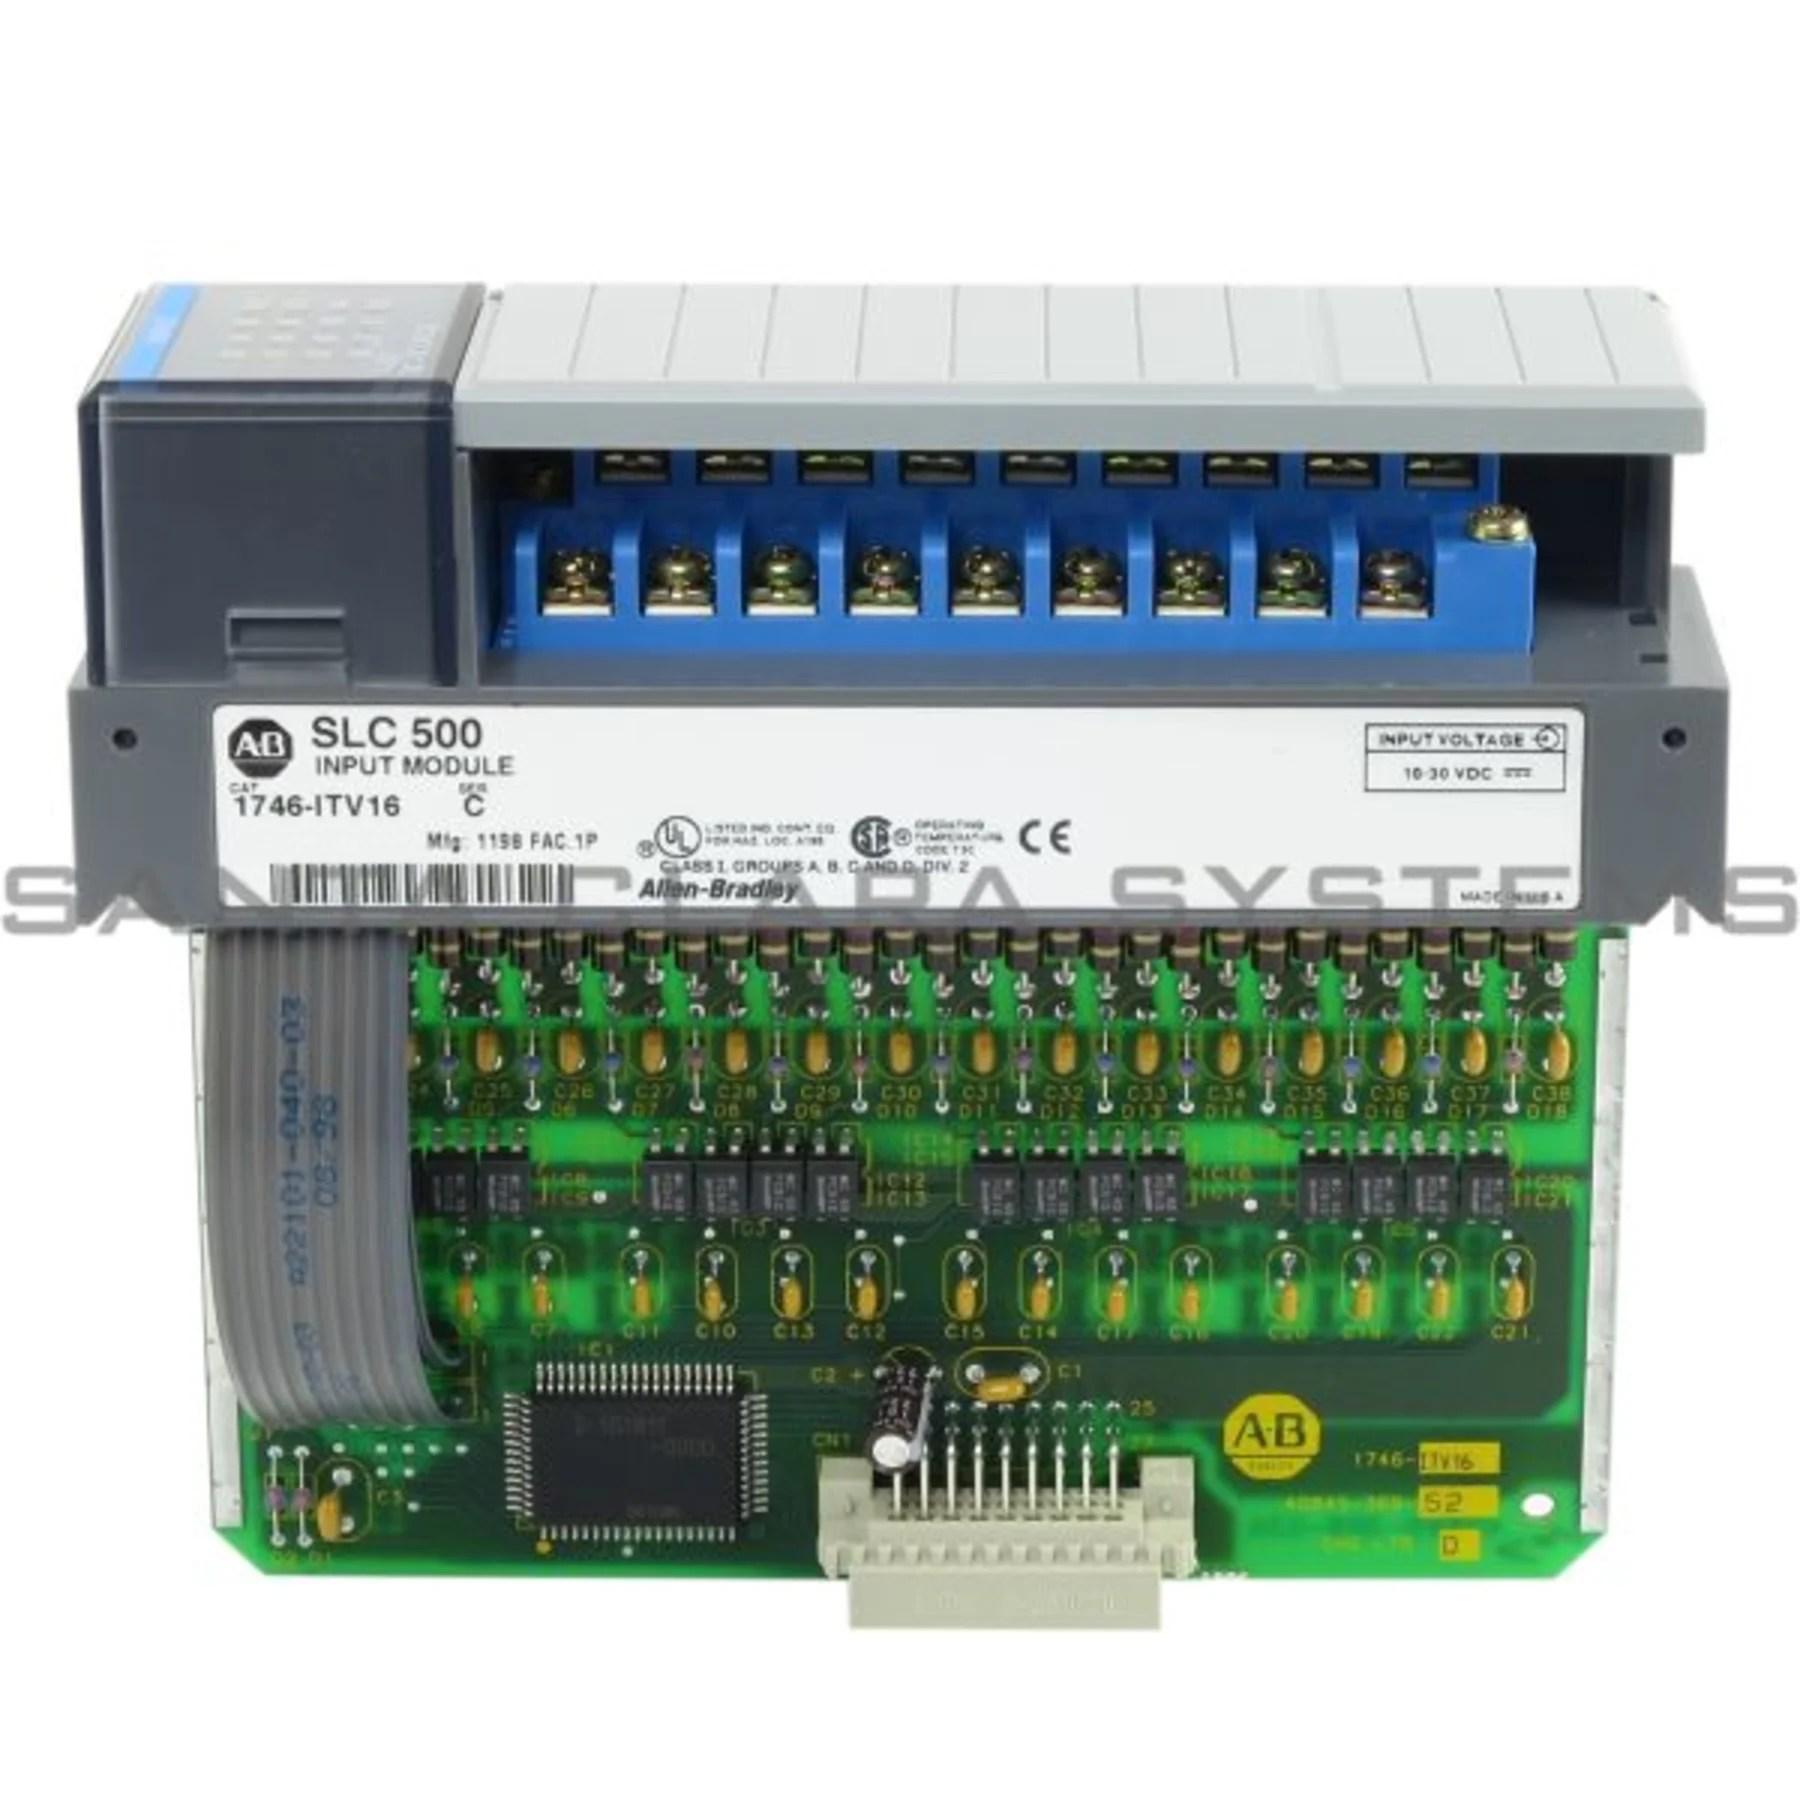 hight resolution of allen bradley 1746 itv16 input module slc 500 product image